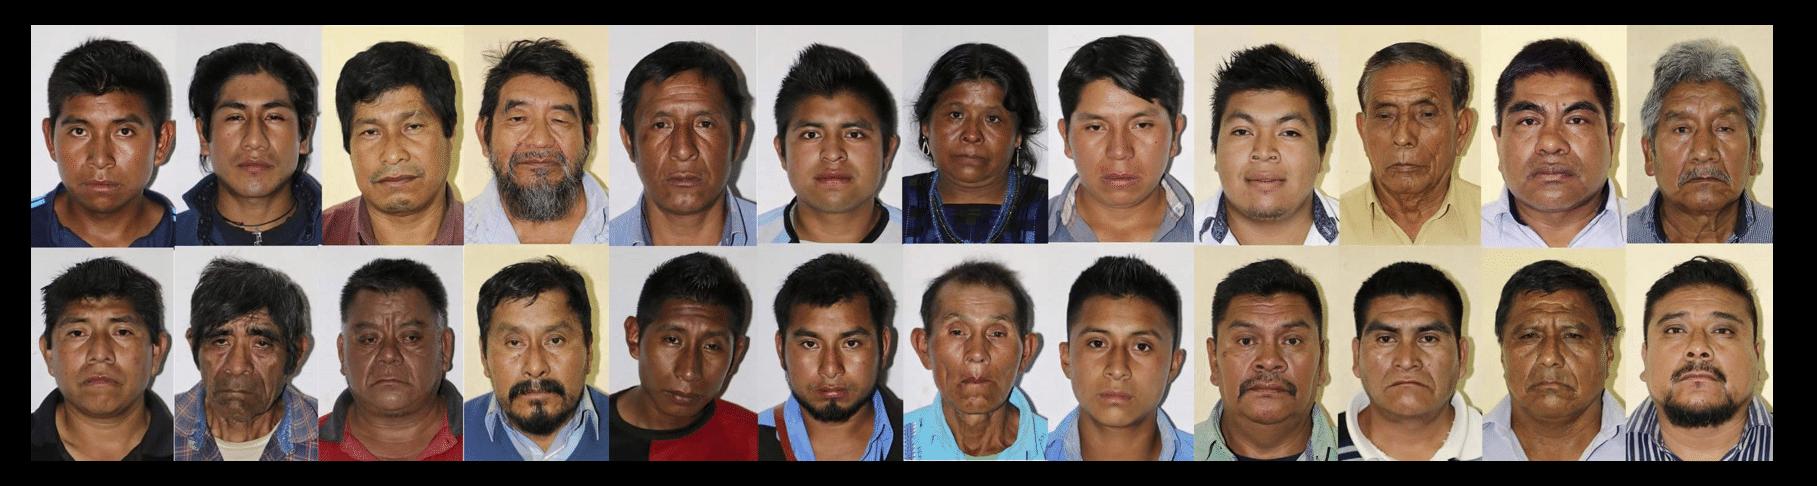 Detienen a 30 líderes indígenas tzeltales en Chiapas